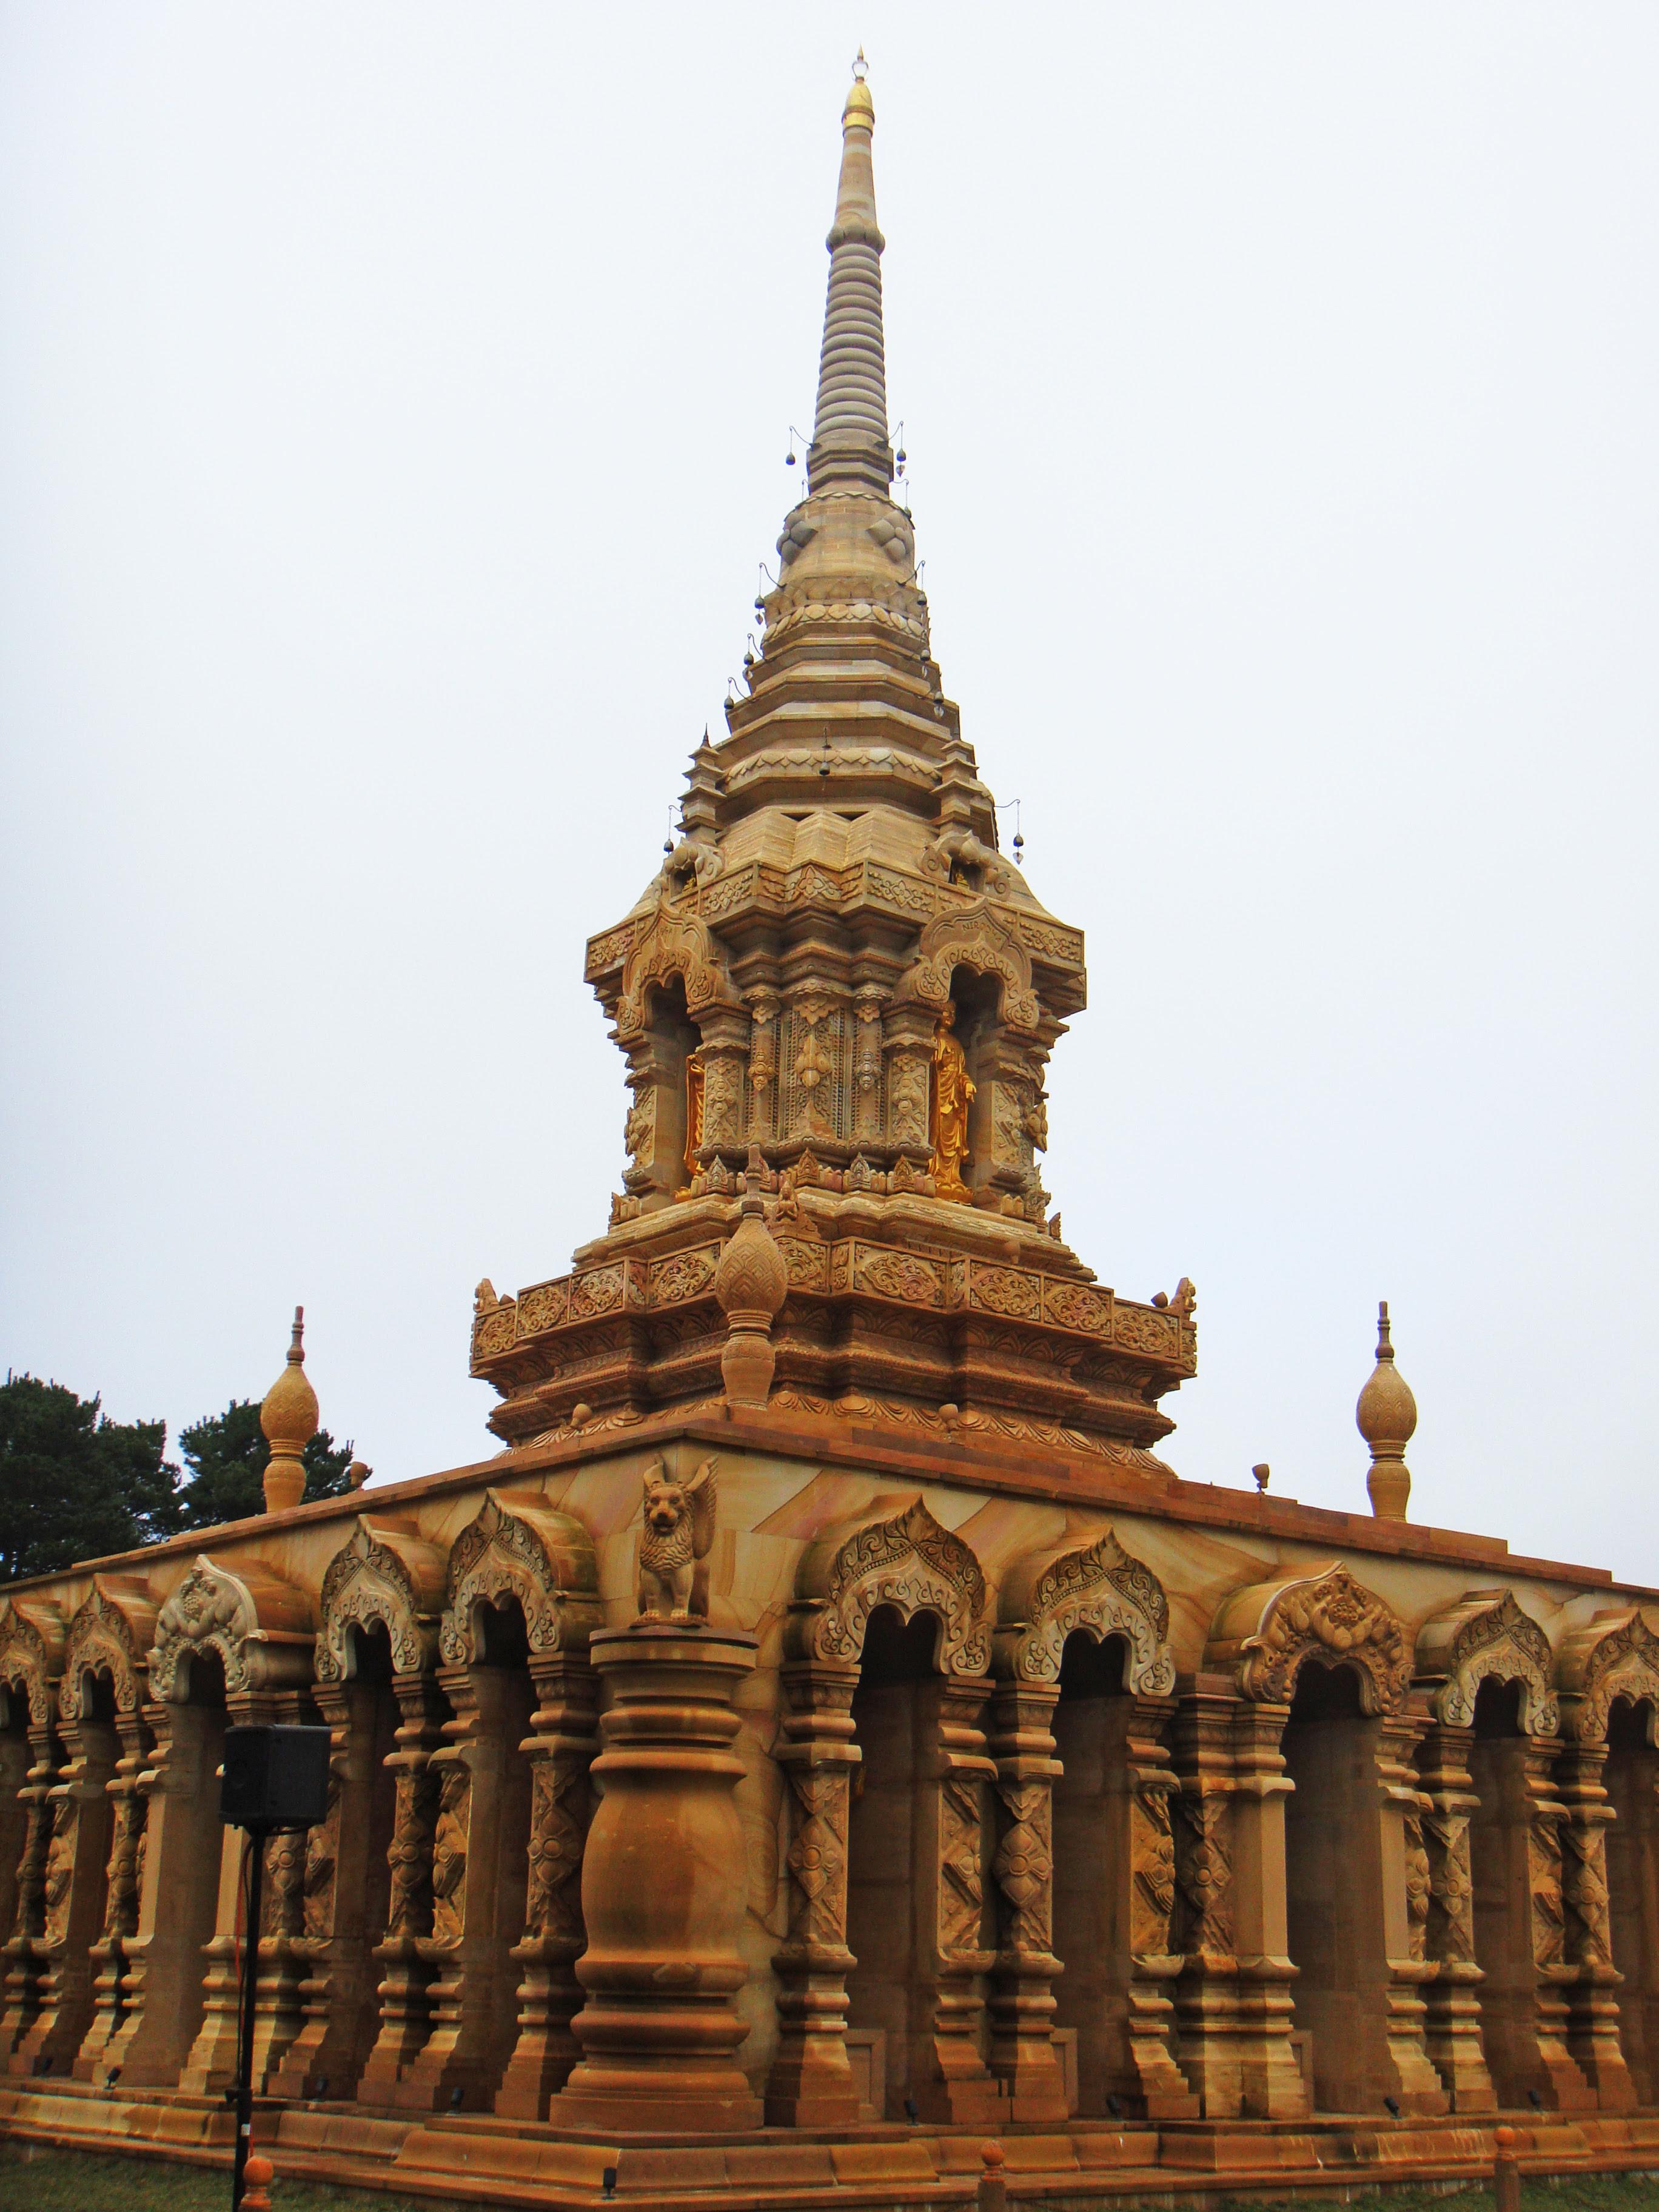 http://upload.wikimedia.org/wikipedia/commons/6/66/Sunnataram_Forest_Monastery_6.jpg